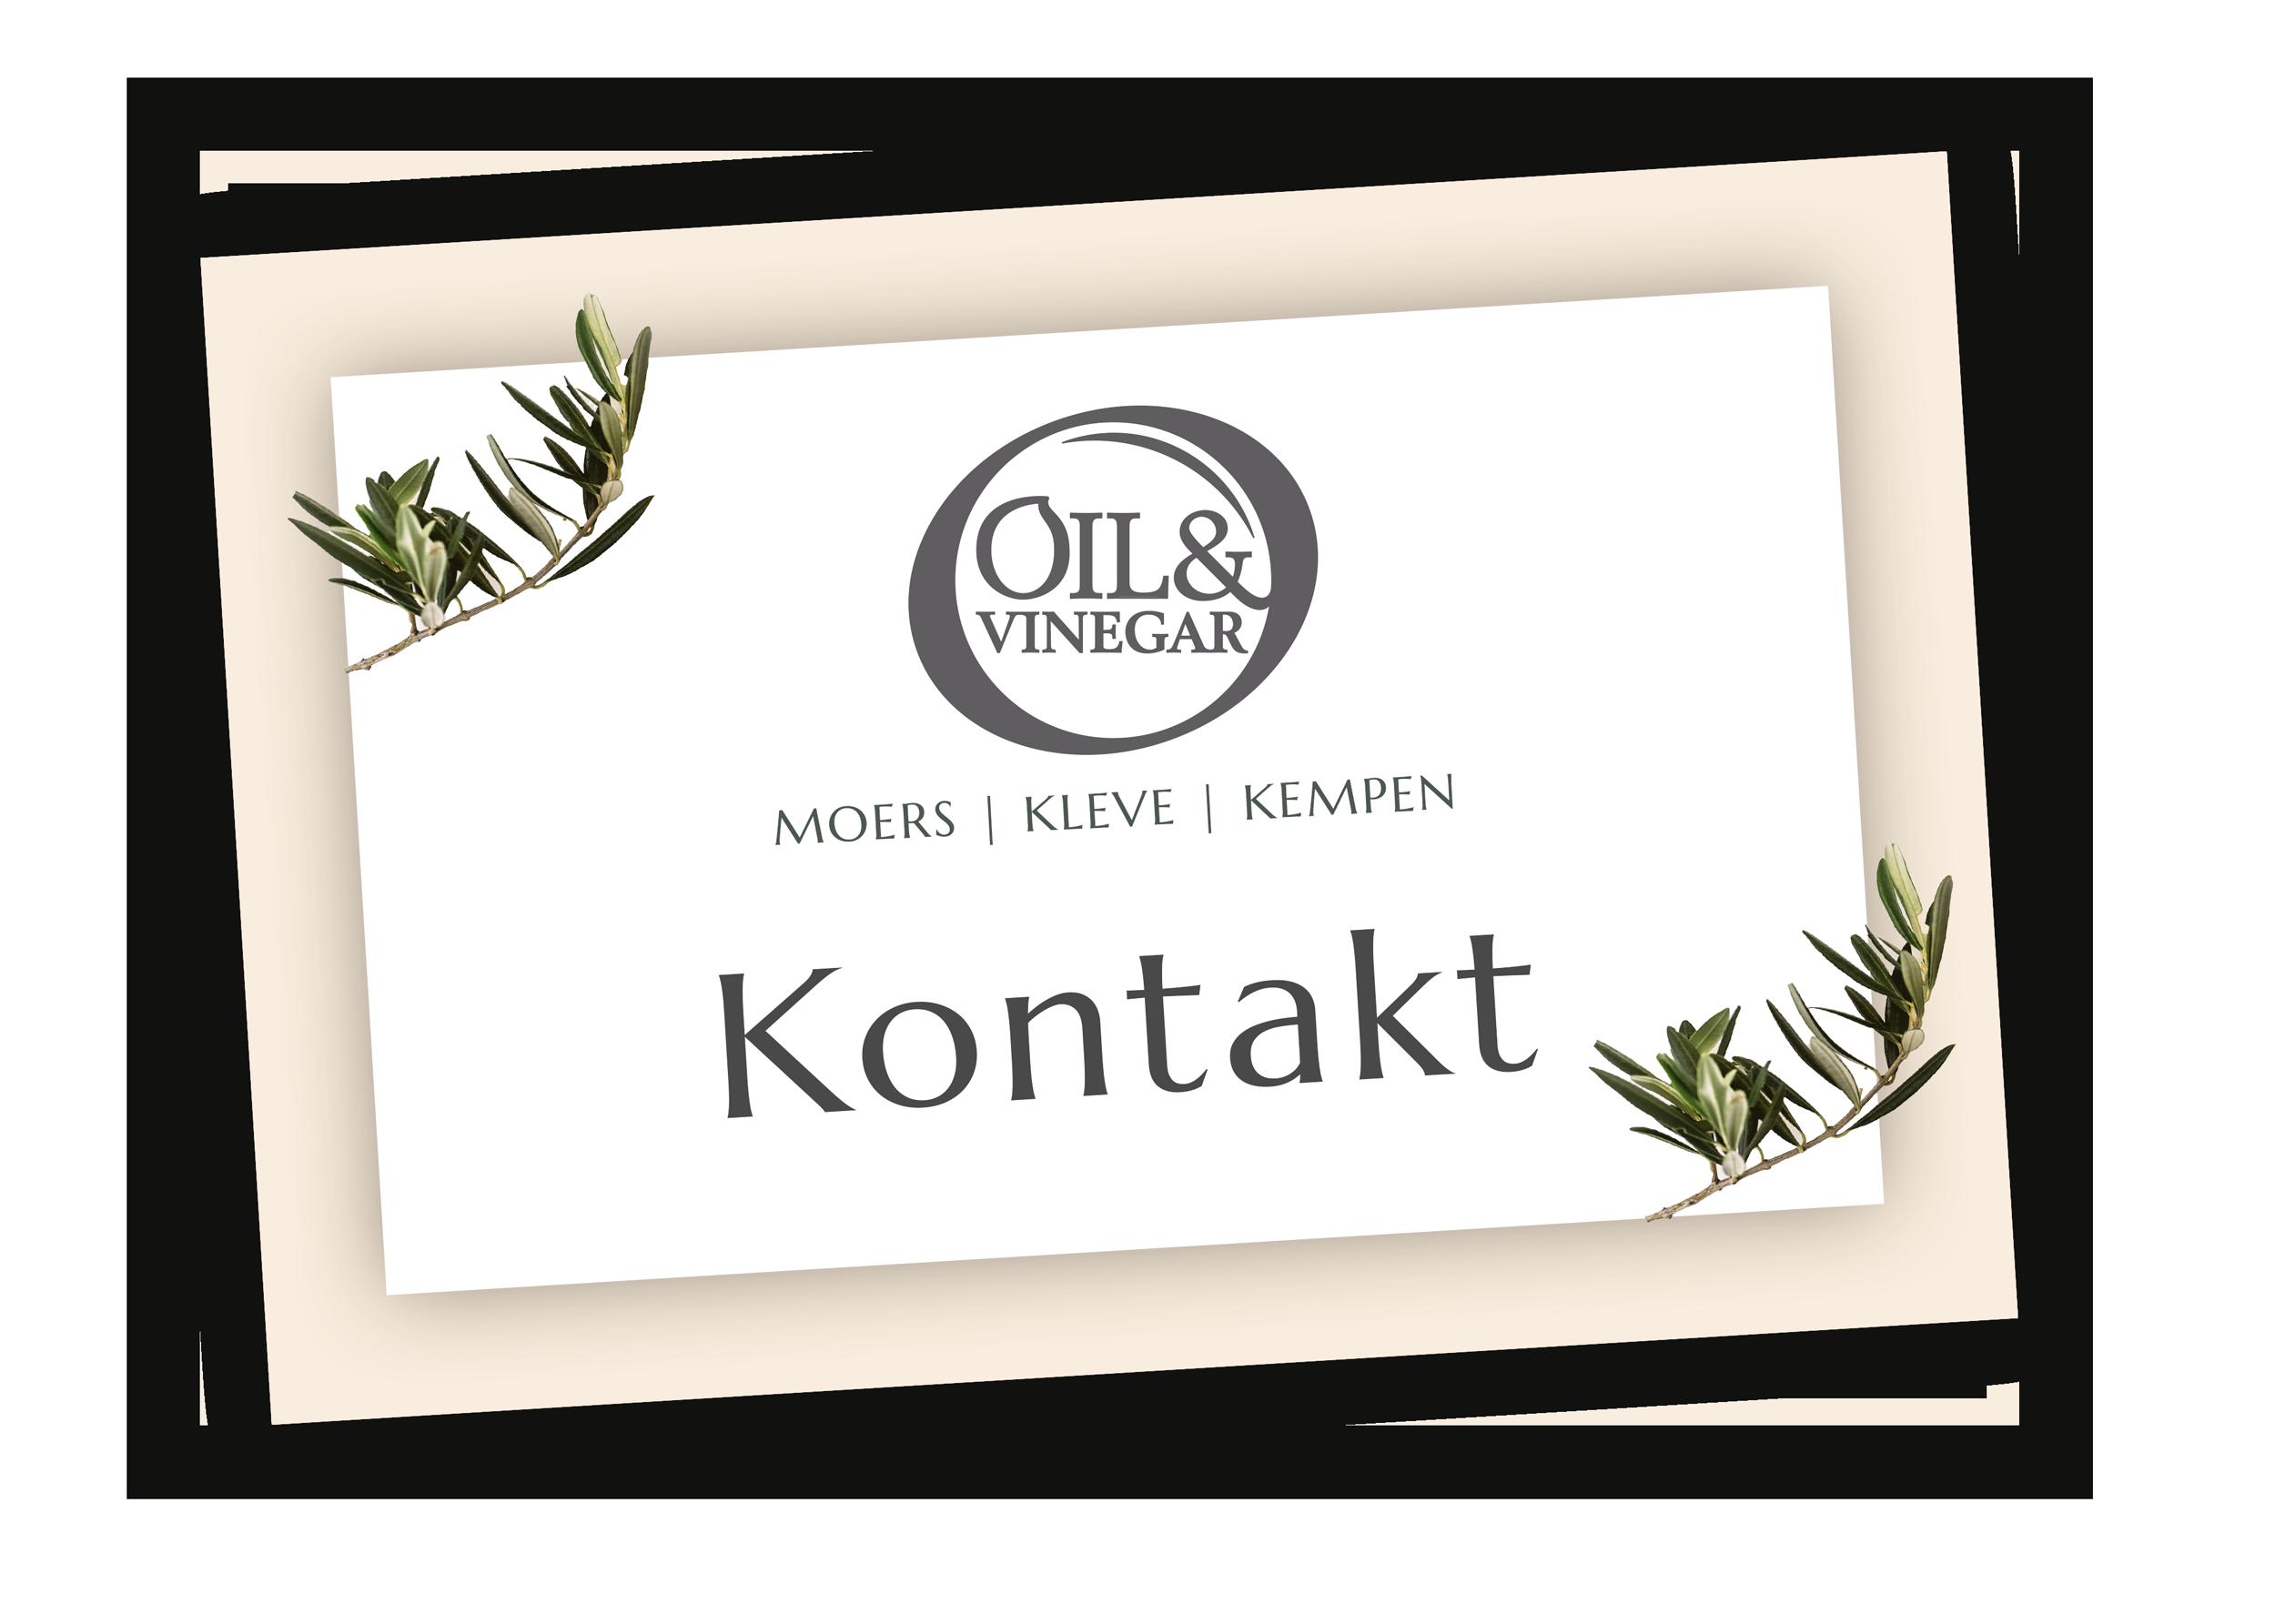 Header-Kontakt-Oil&Vinegar-Kempen-Kleve-Moers